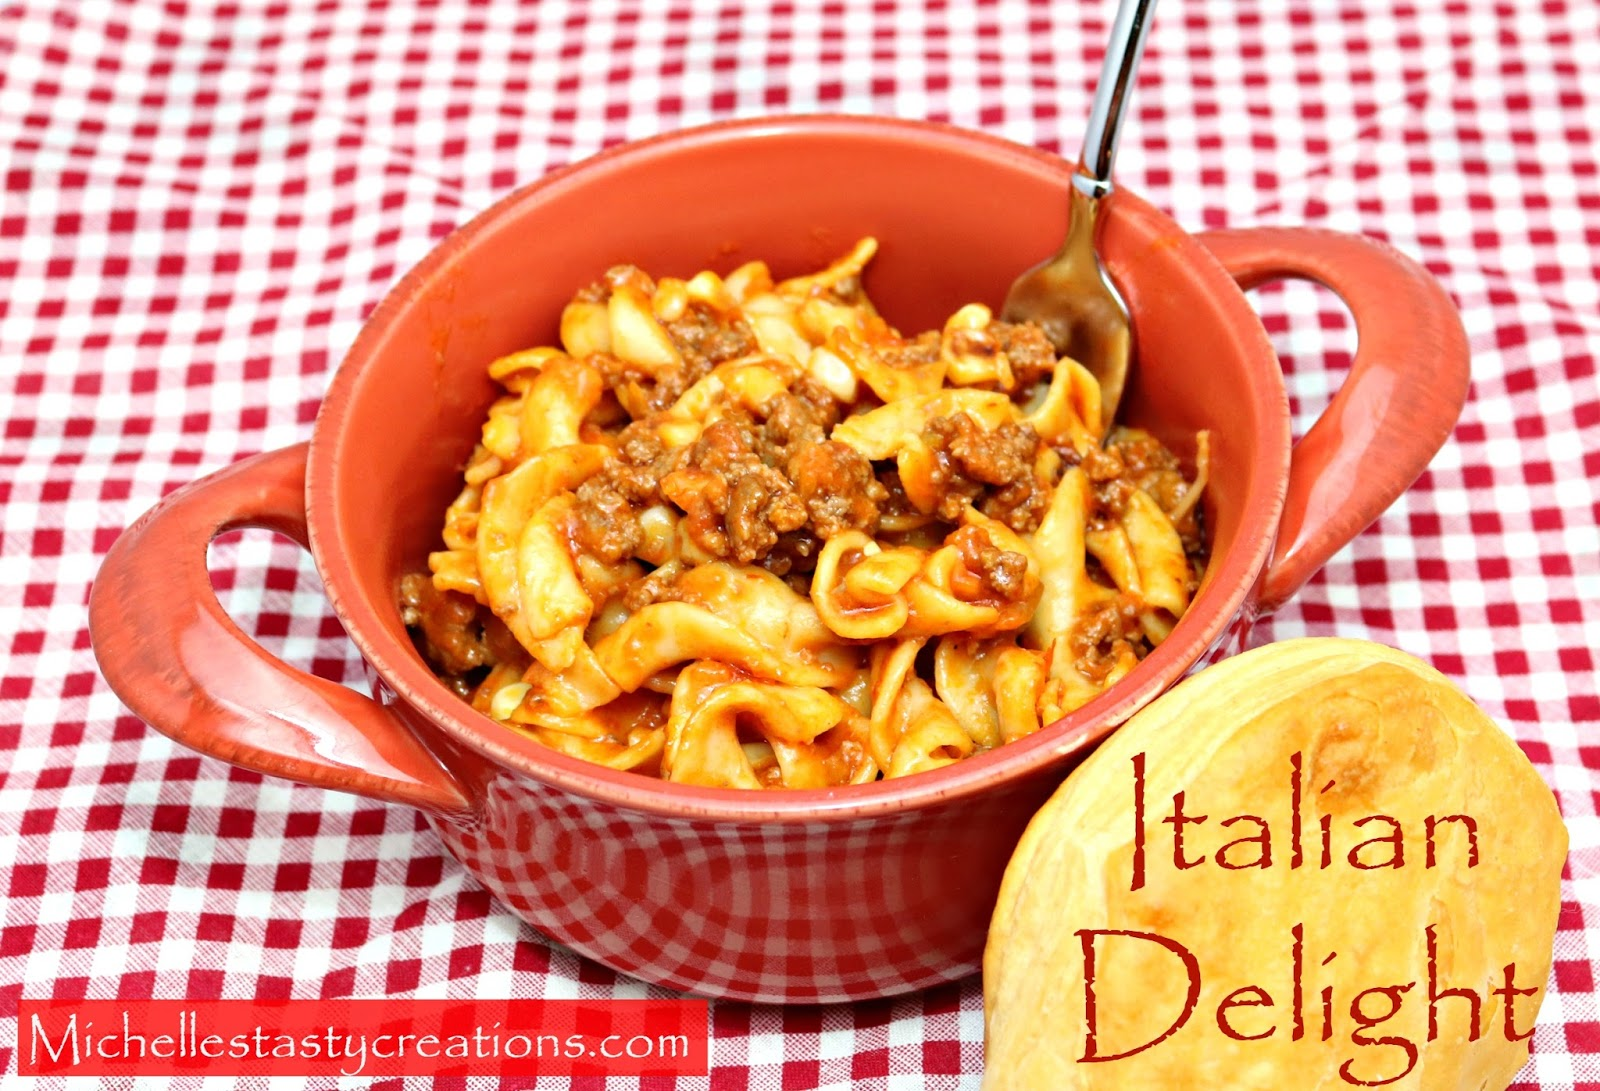 Michelles tasty creations italian delight italian delight forumfinder Gallery